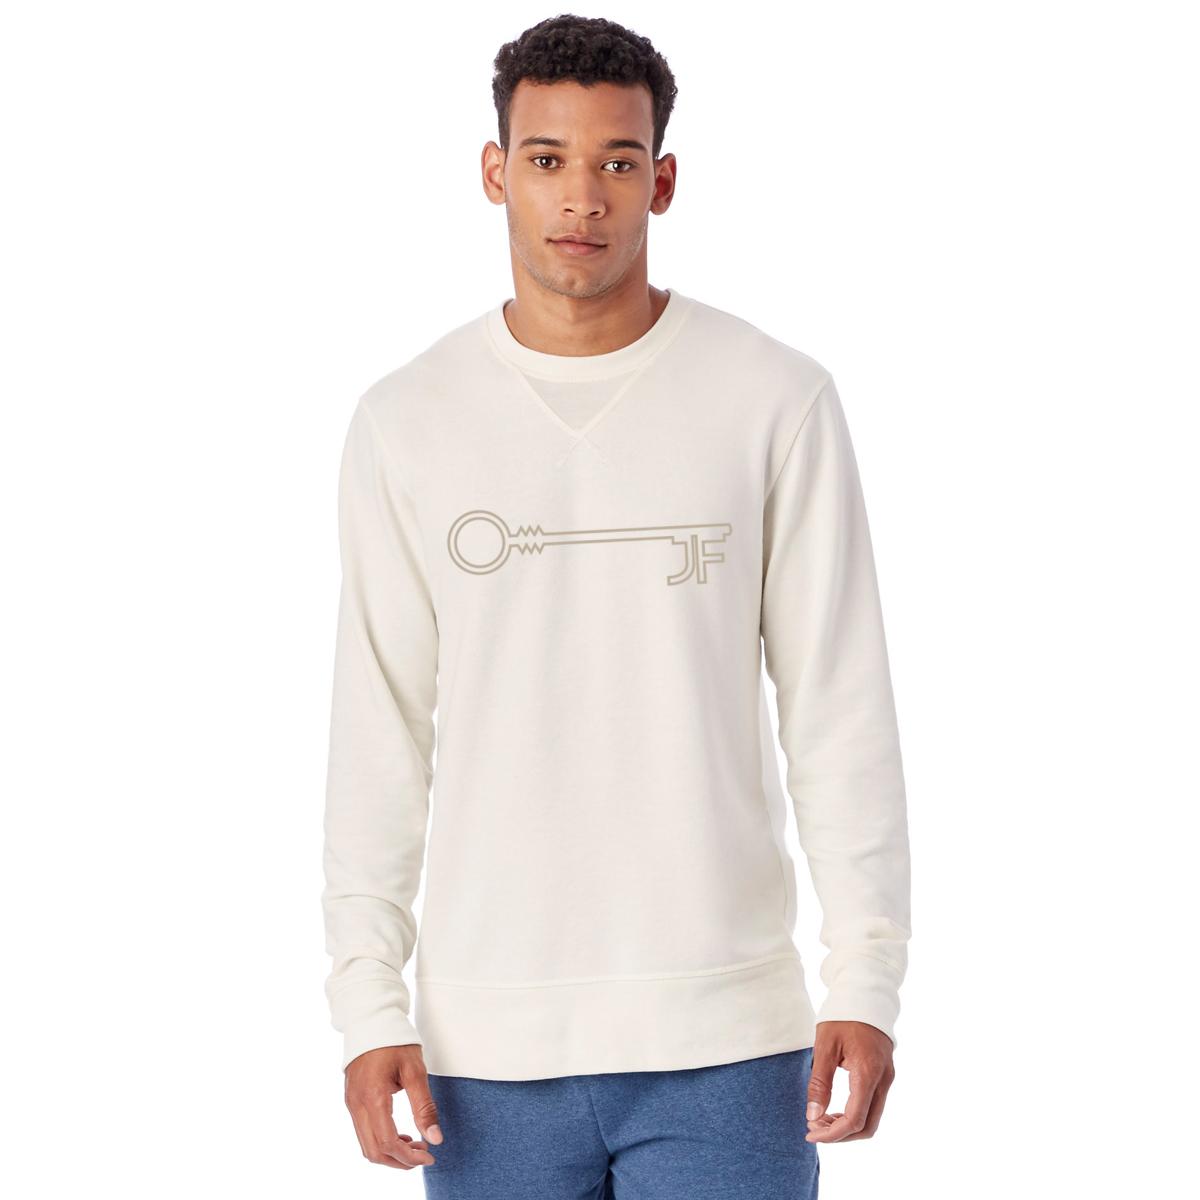 JF Key Unisex Cream Crewneck Sweatshirt